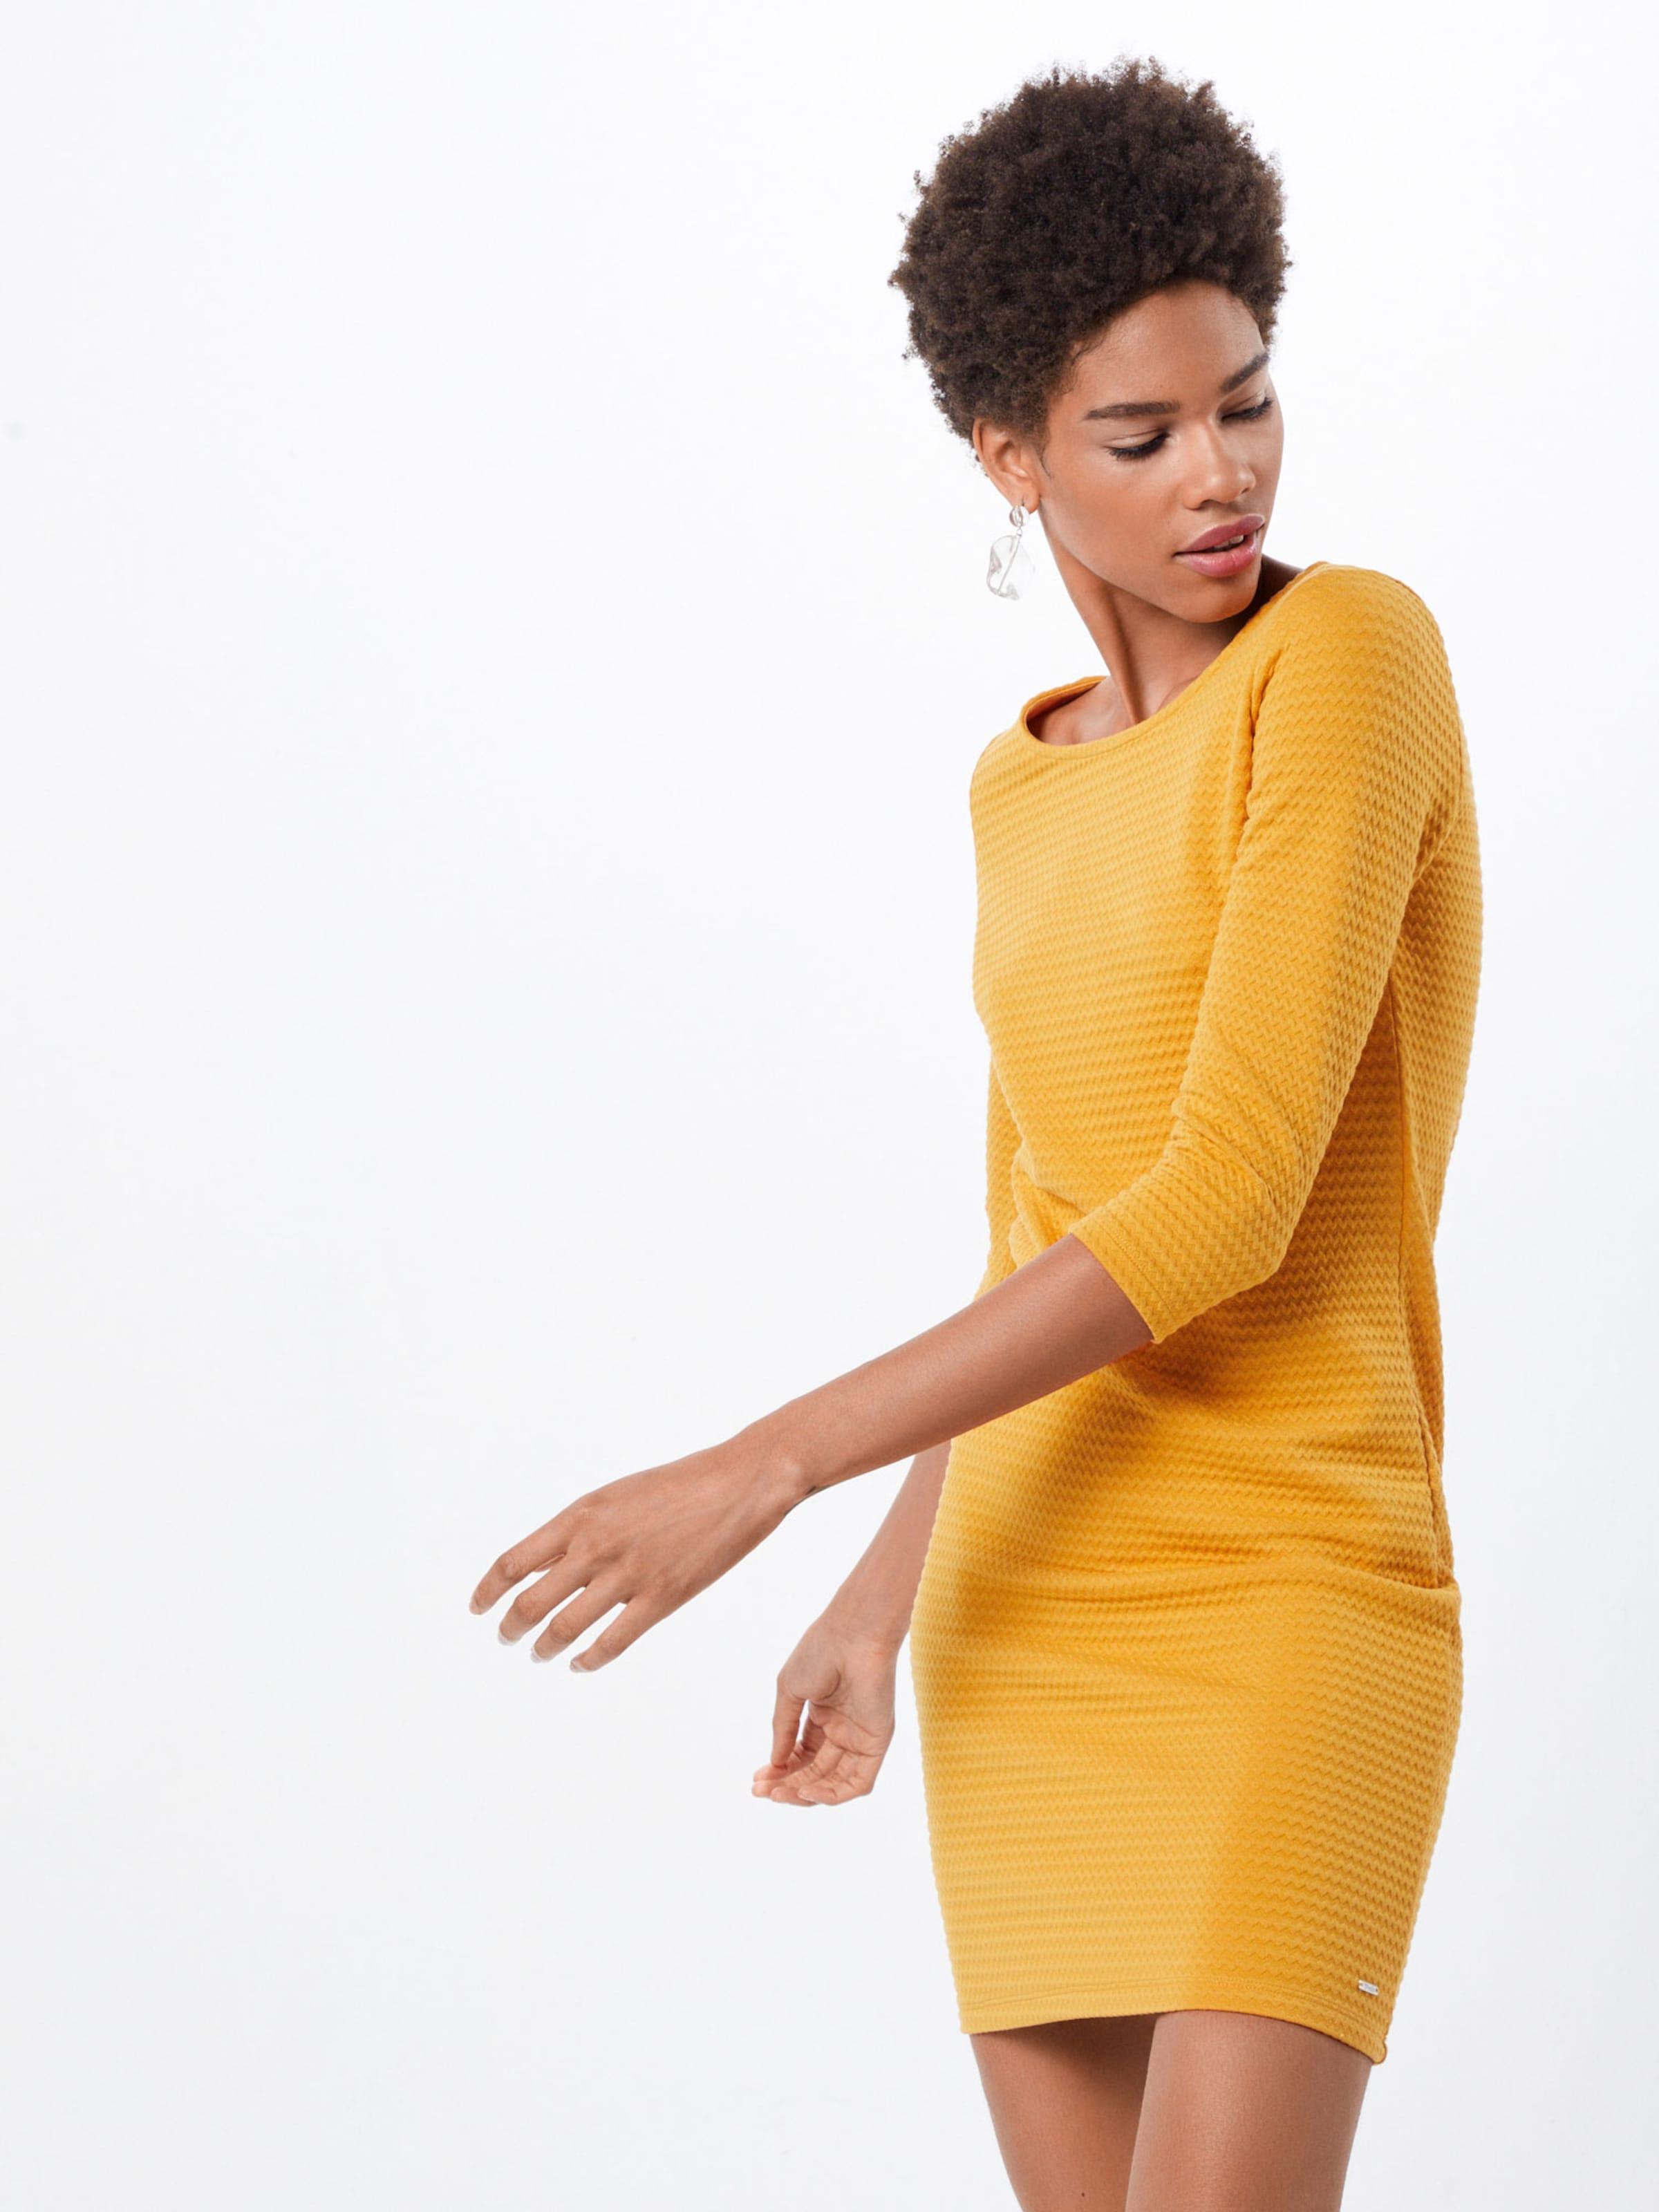 Denim Kleid Tailor Tom In Goldgelb 8vmNn0wO